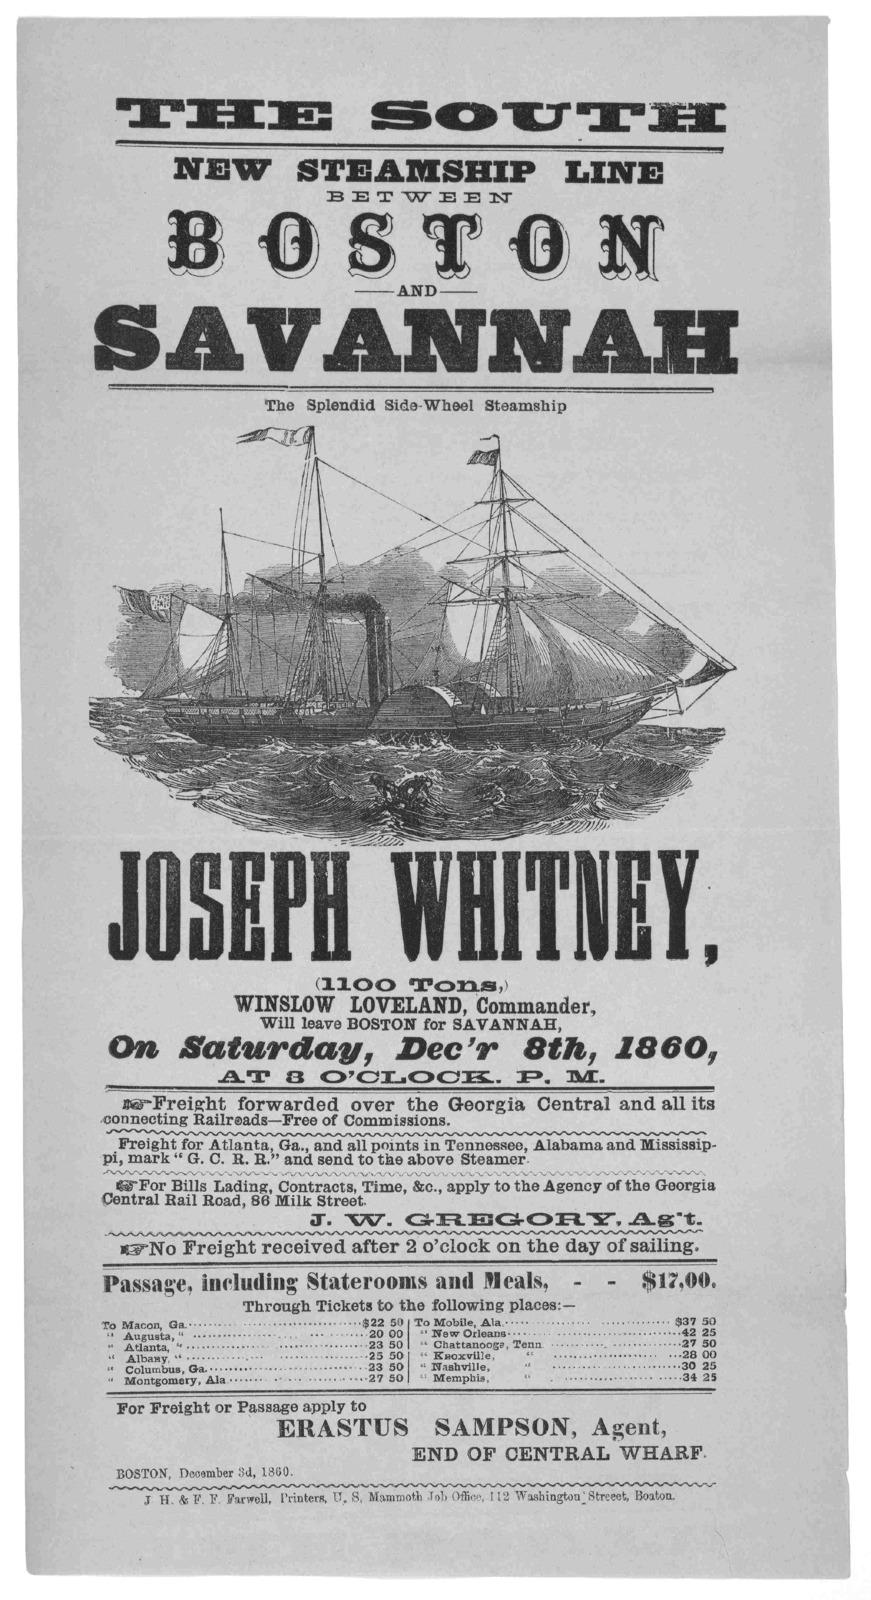 The South New steamship line between Boston and Savannah. The splendid side wheel steamship Joseph Whitney ... Will leave Boston for Savannah. on Saturday, Dec'r 8th, 1860 at 3 o'clock, P M ... Boston, December 3d, 1860 Boston. J. H. & F. F. Far